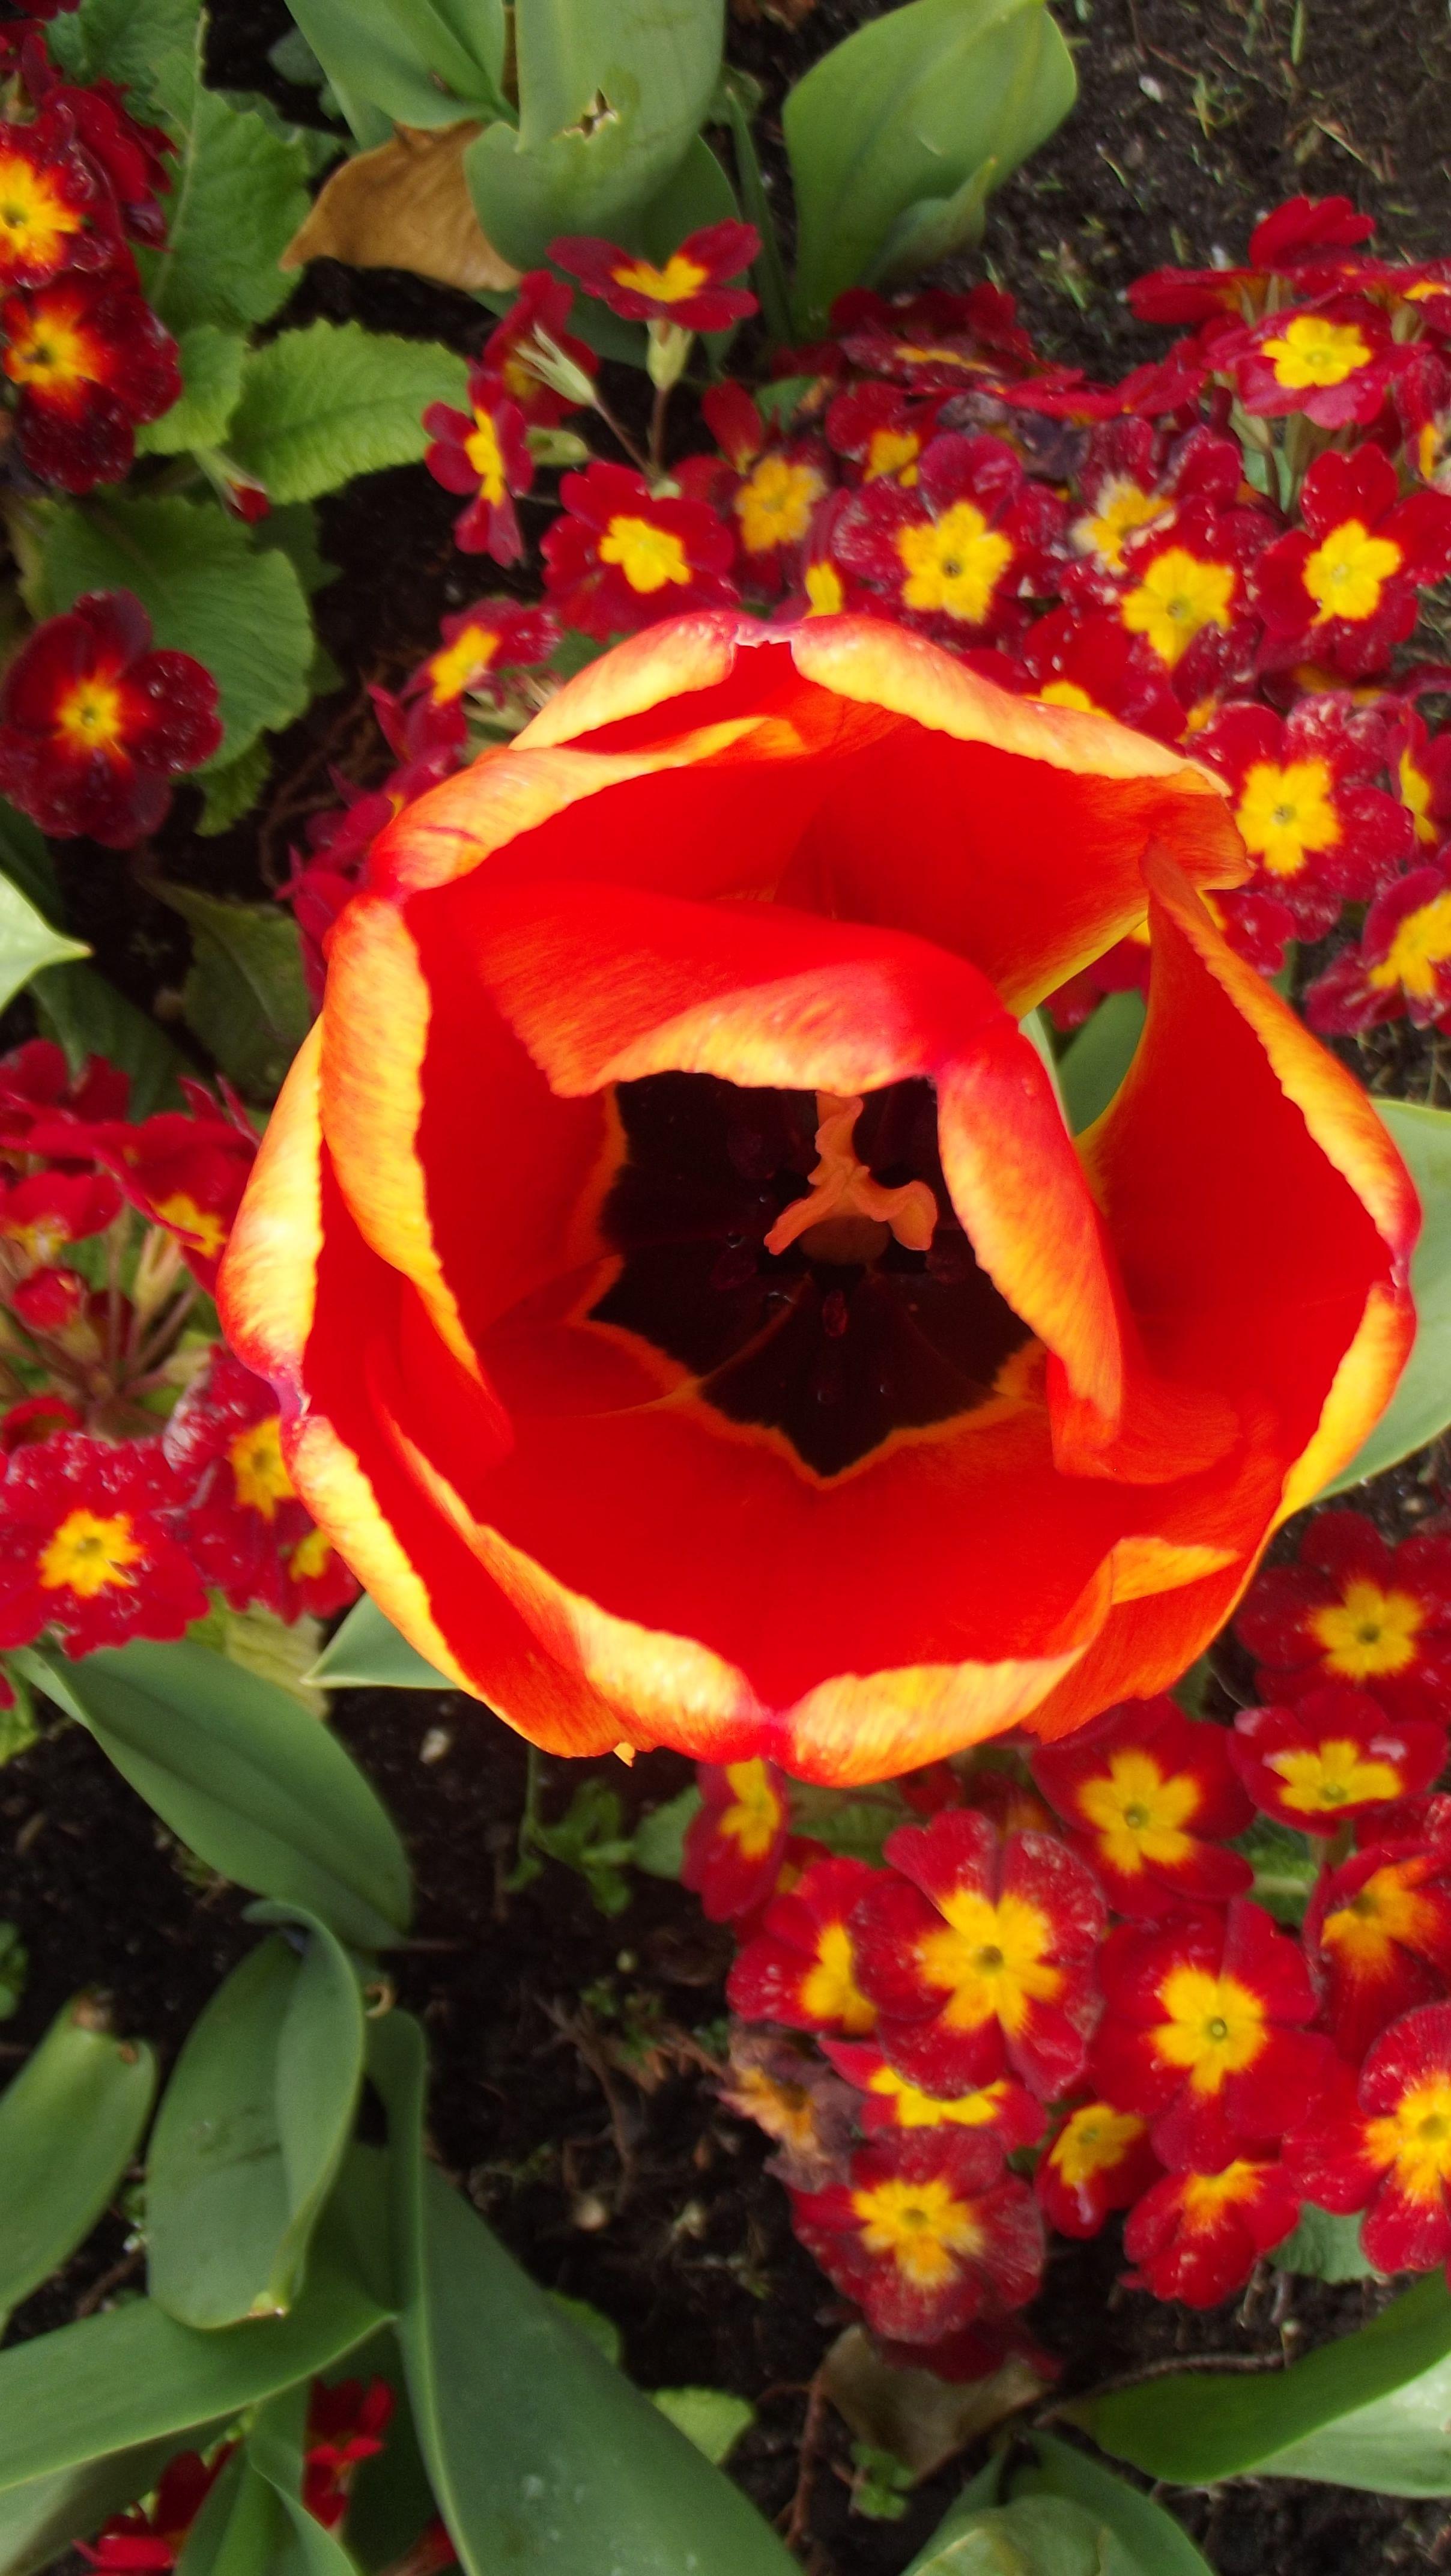 Tulip Festival in Powerscourt Gardens, Powerscourt Estate, County Wicklow, Ireland. www.powerscourt.ie